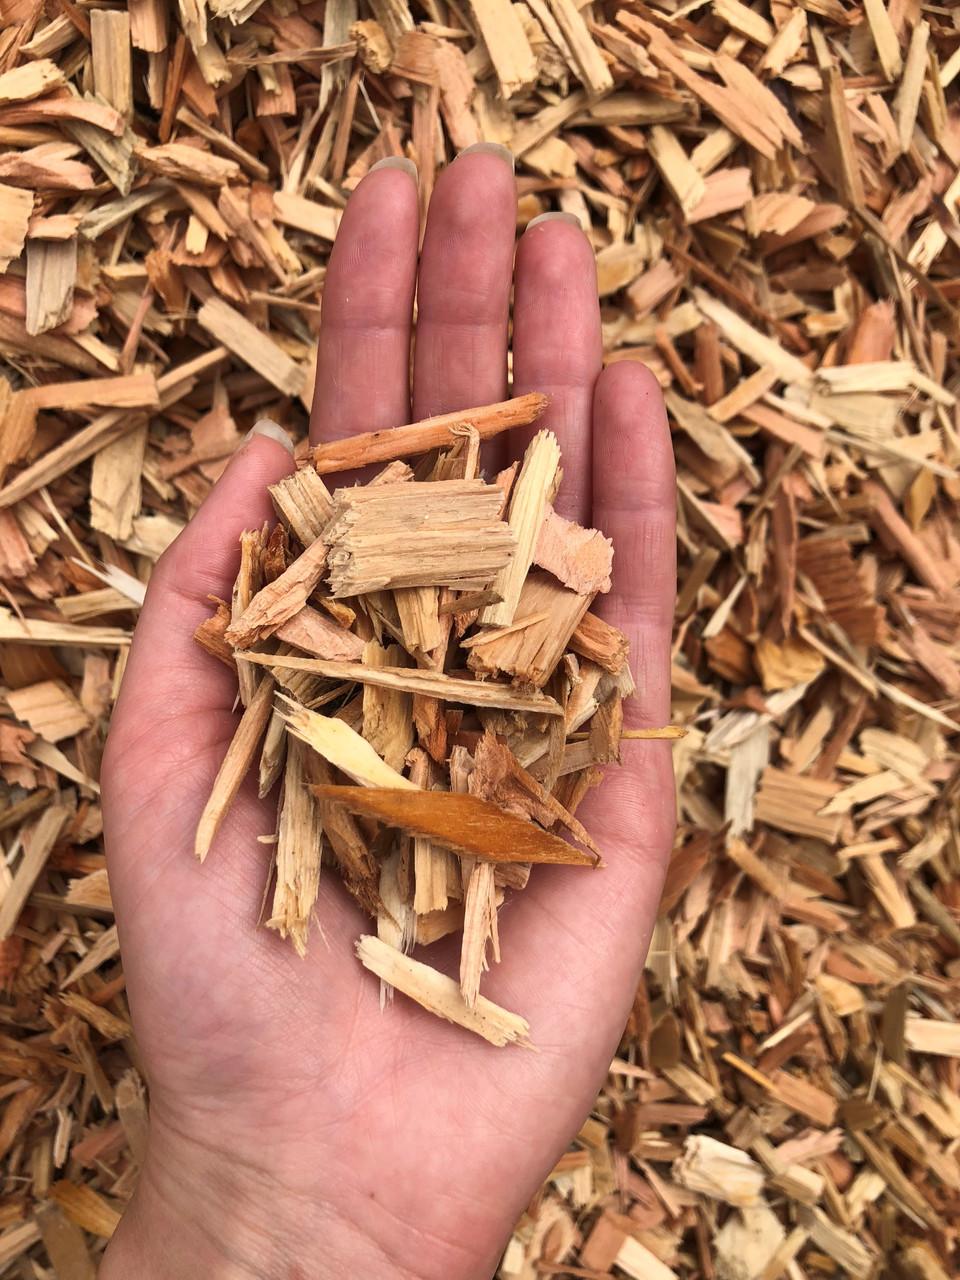 Playchips, Playground woodchips